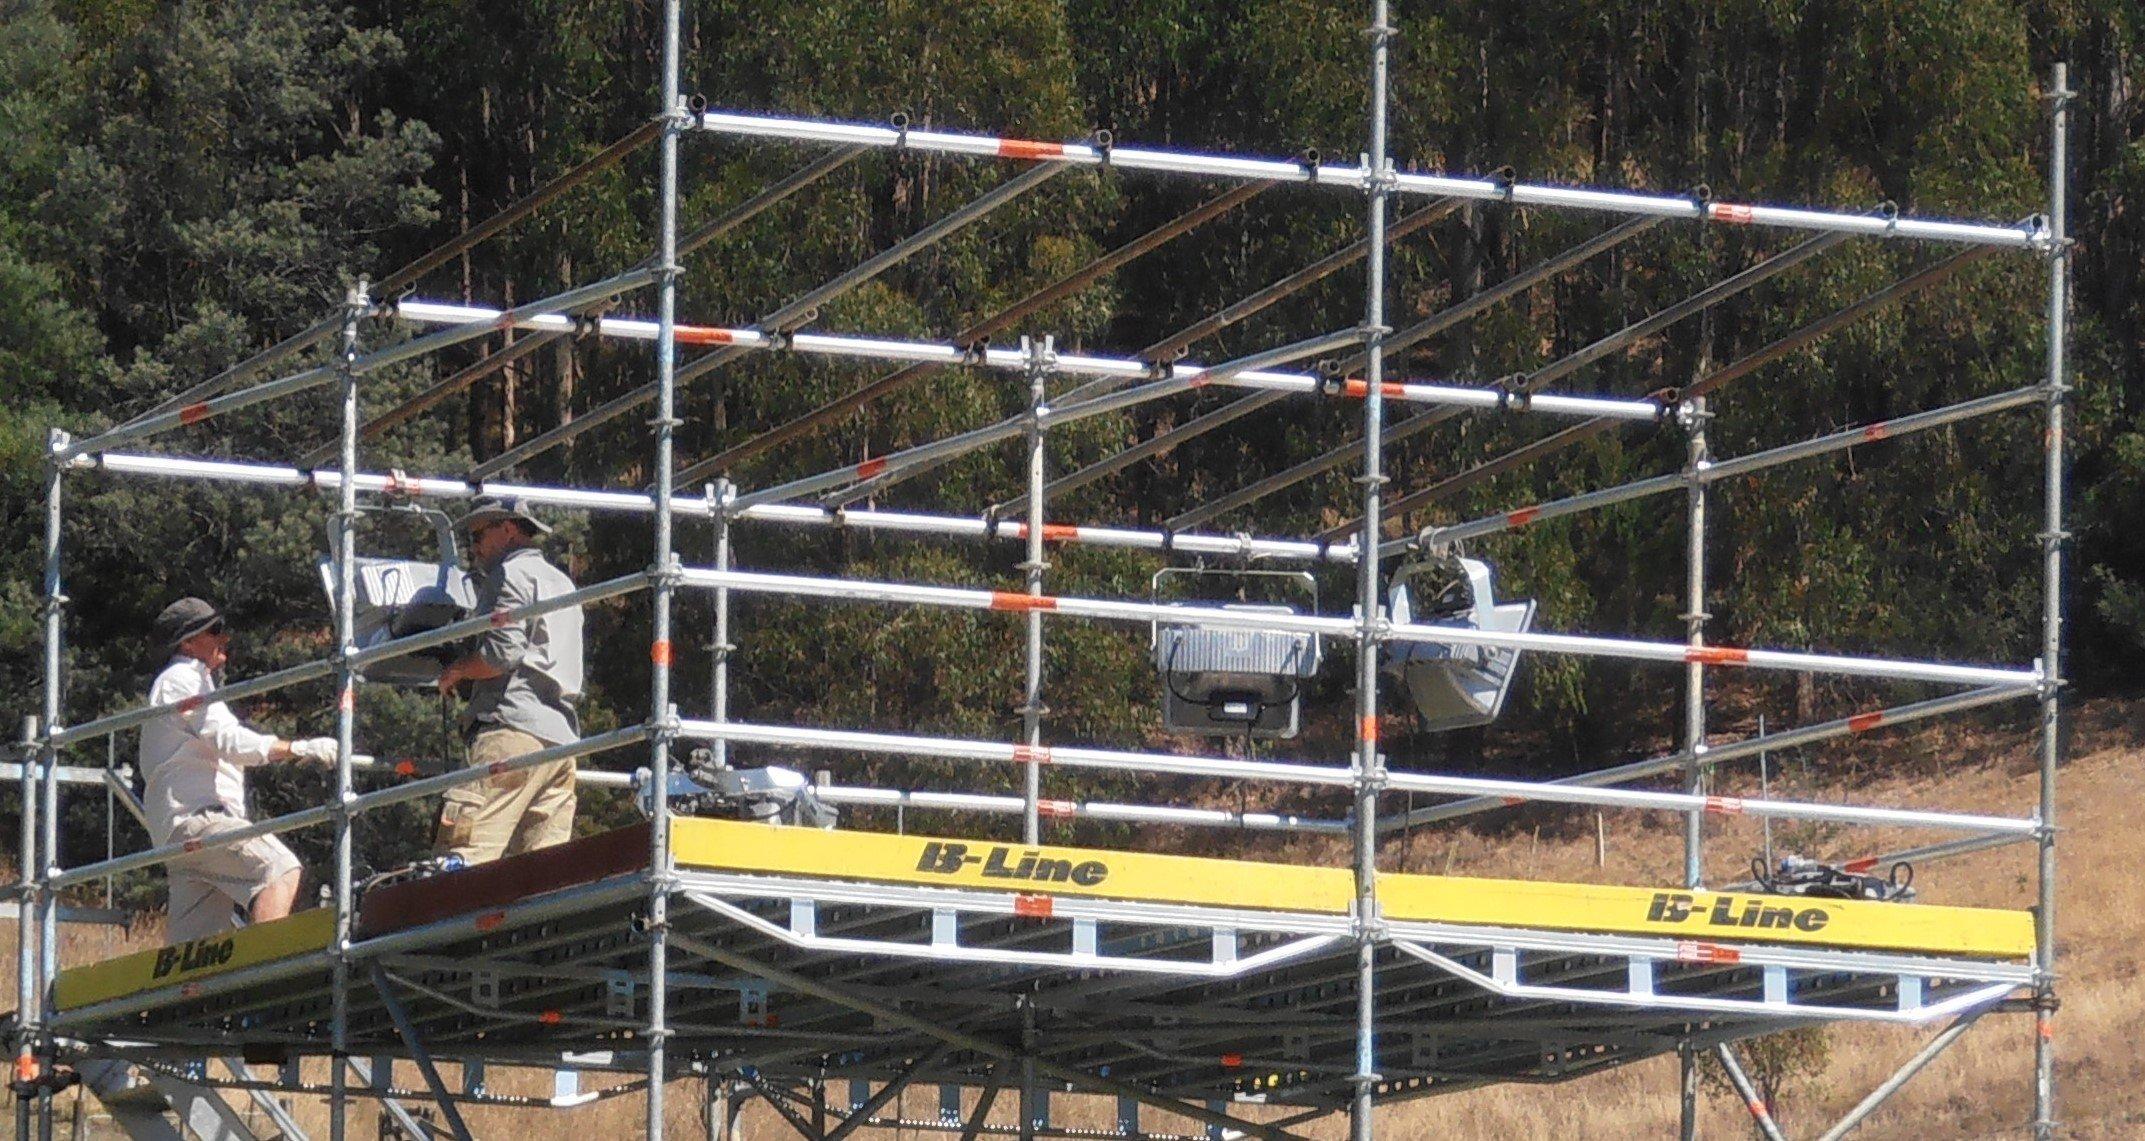 Modular scaffolding